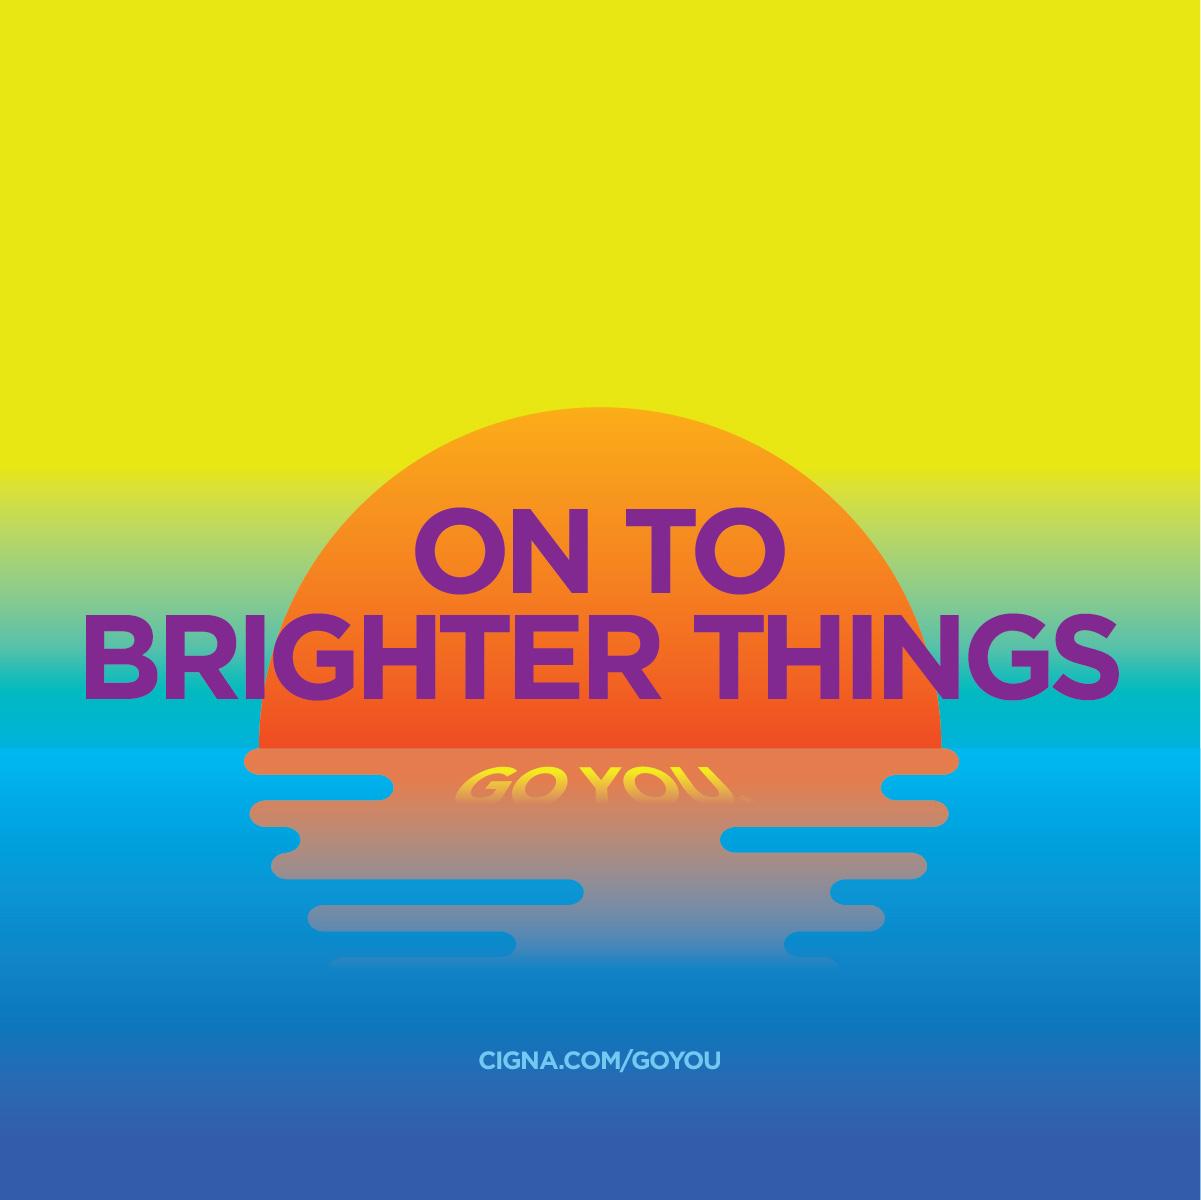 On to brighter things-08.jpg